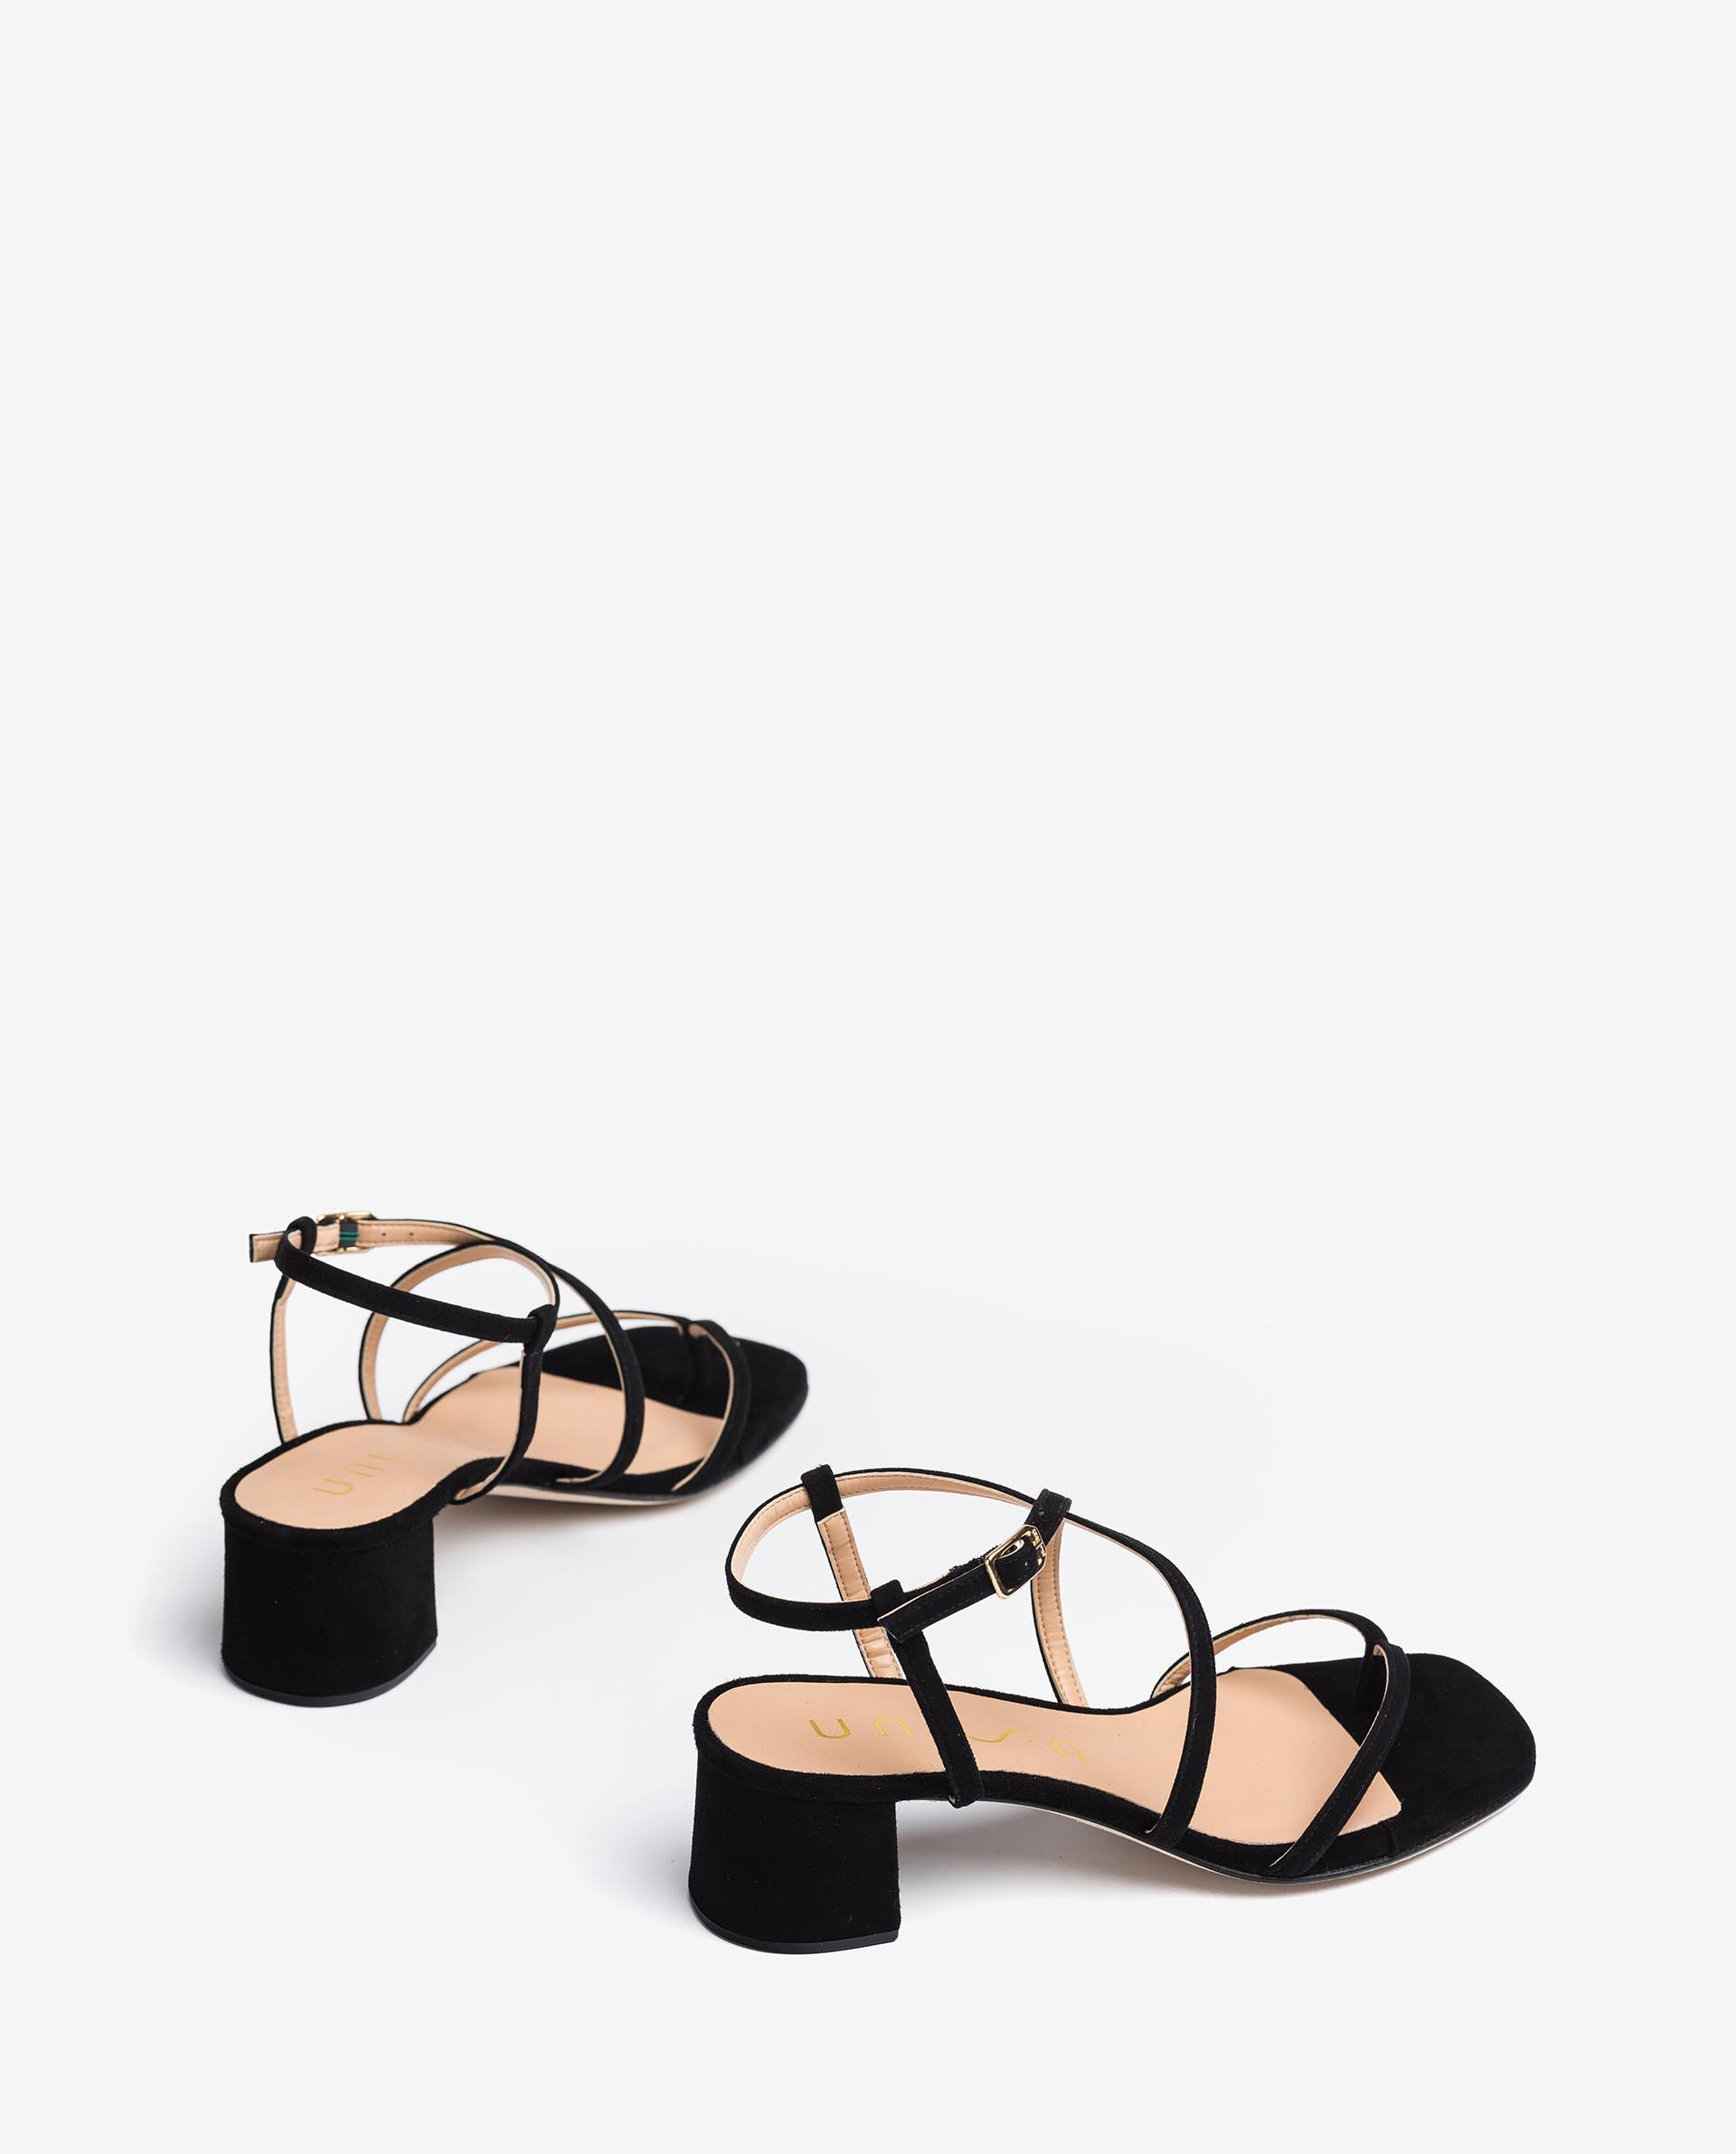 UNISA Kid suede strappy sandals KEKE_21_KS 2